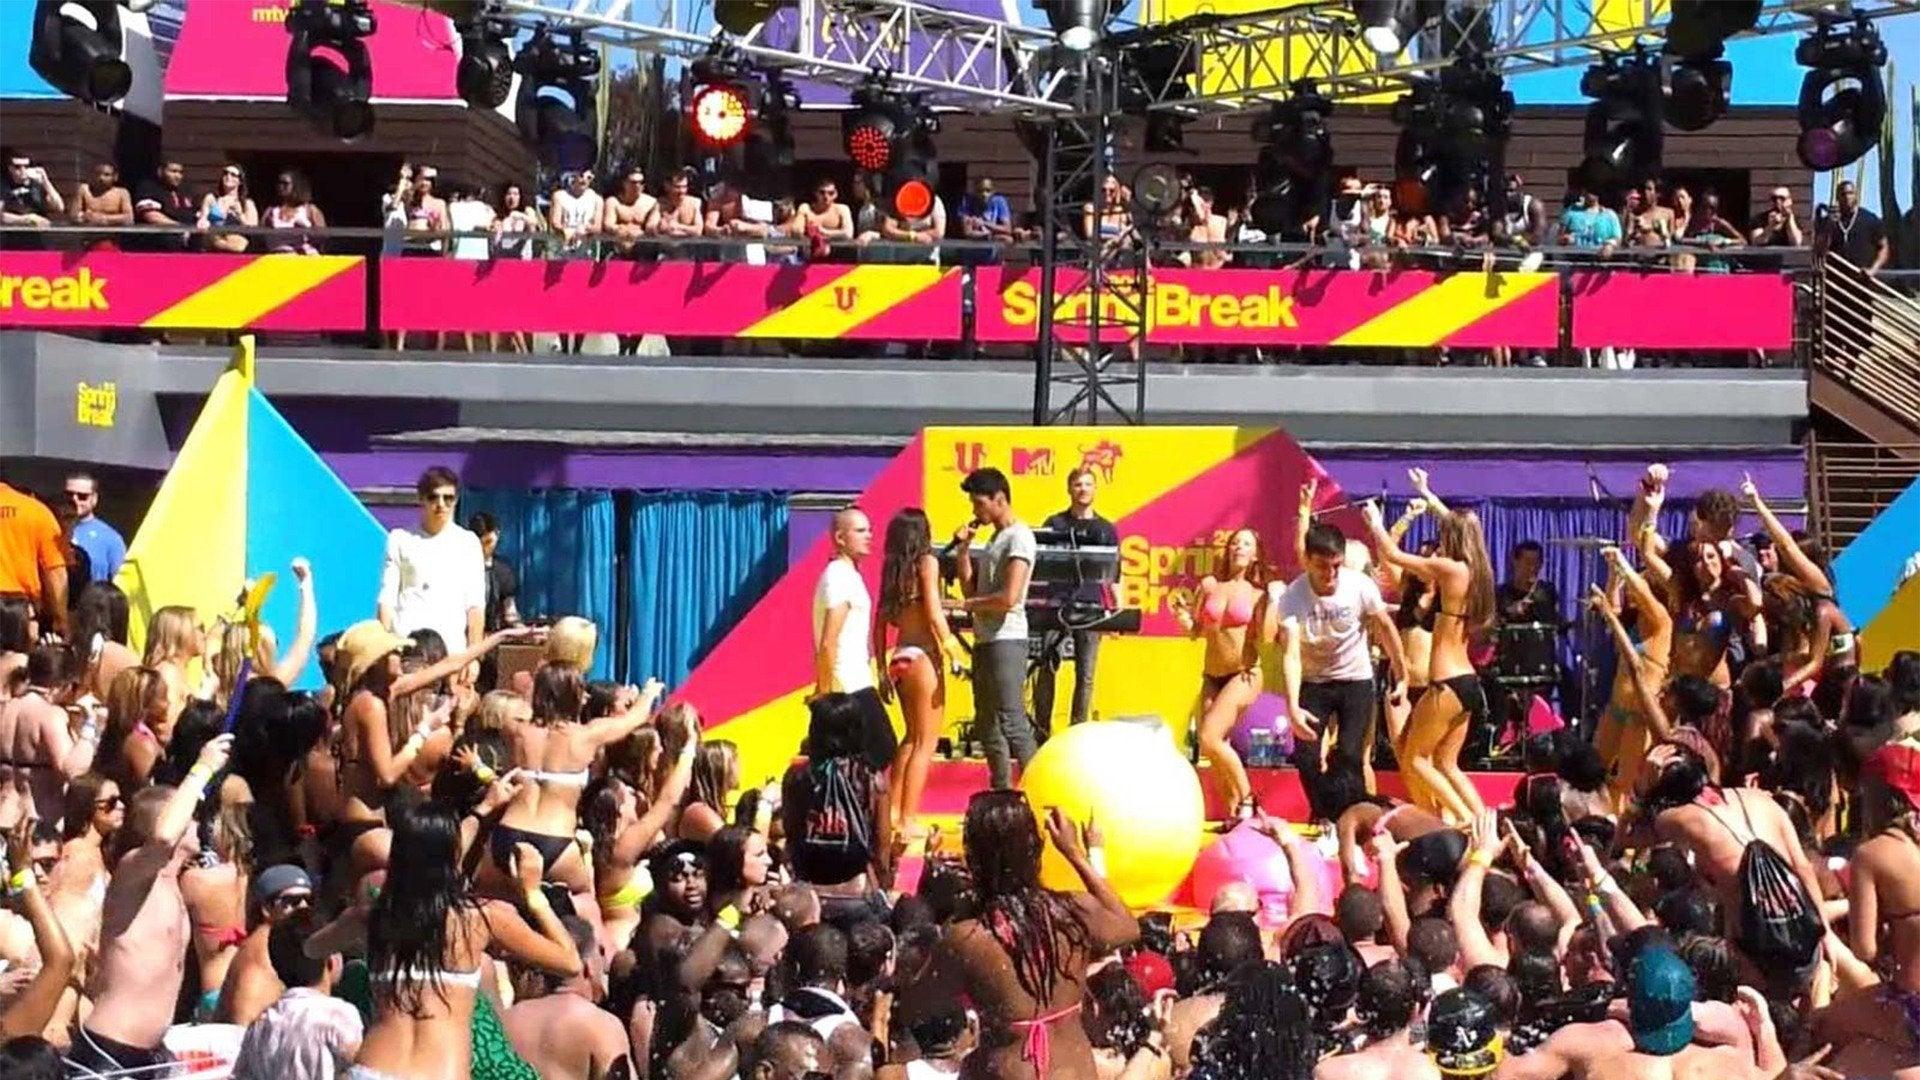 MTV's Spring Break 2019